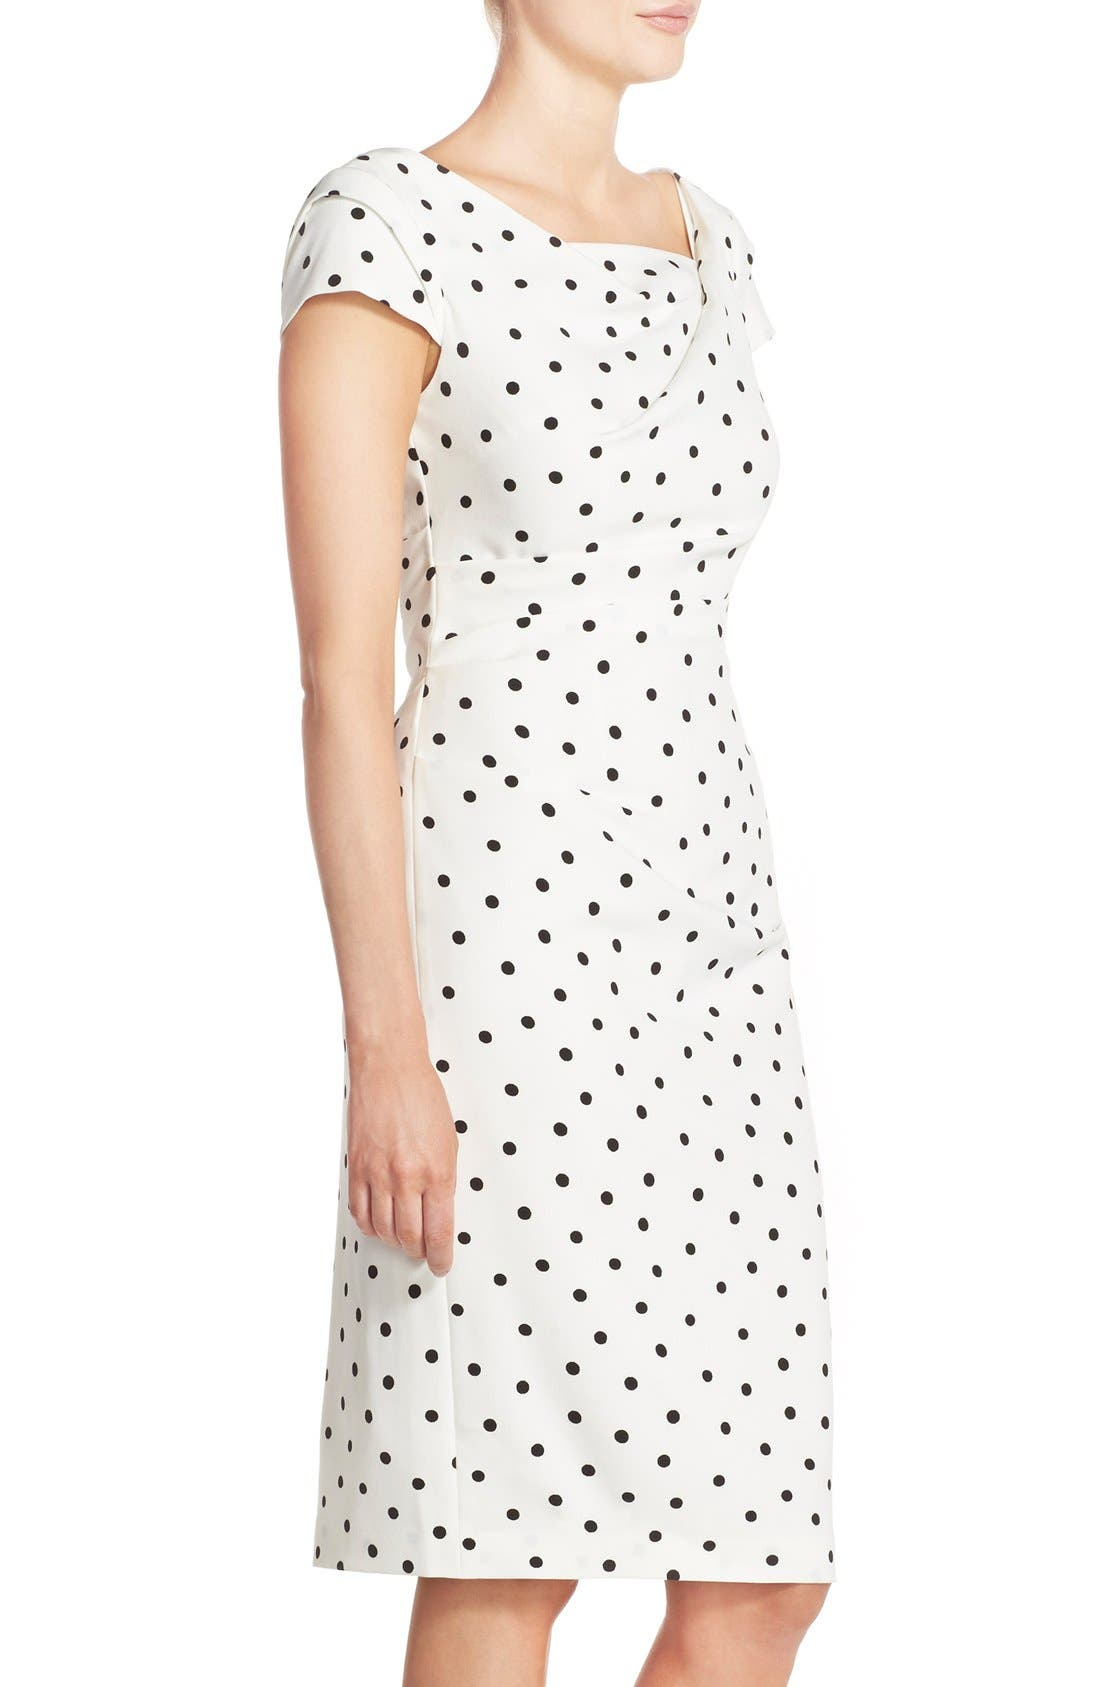 ADRIANNA PAPELL,                             Polka Dot Crepe Sheath Dress,                             Alternate thumbnail 2, color,                             900